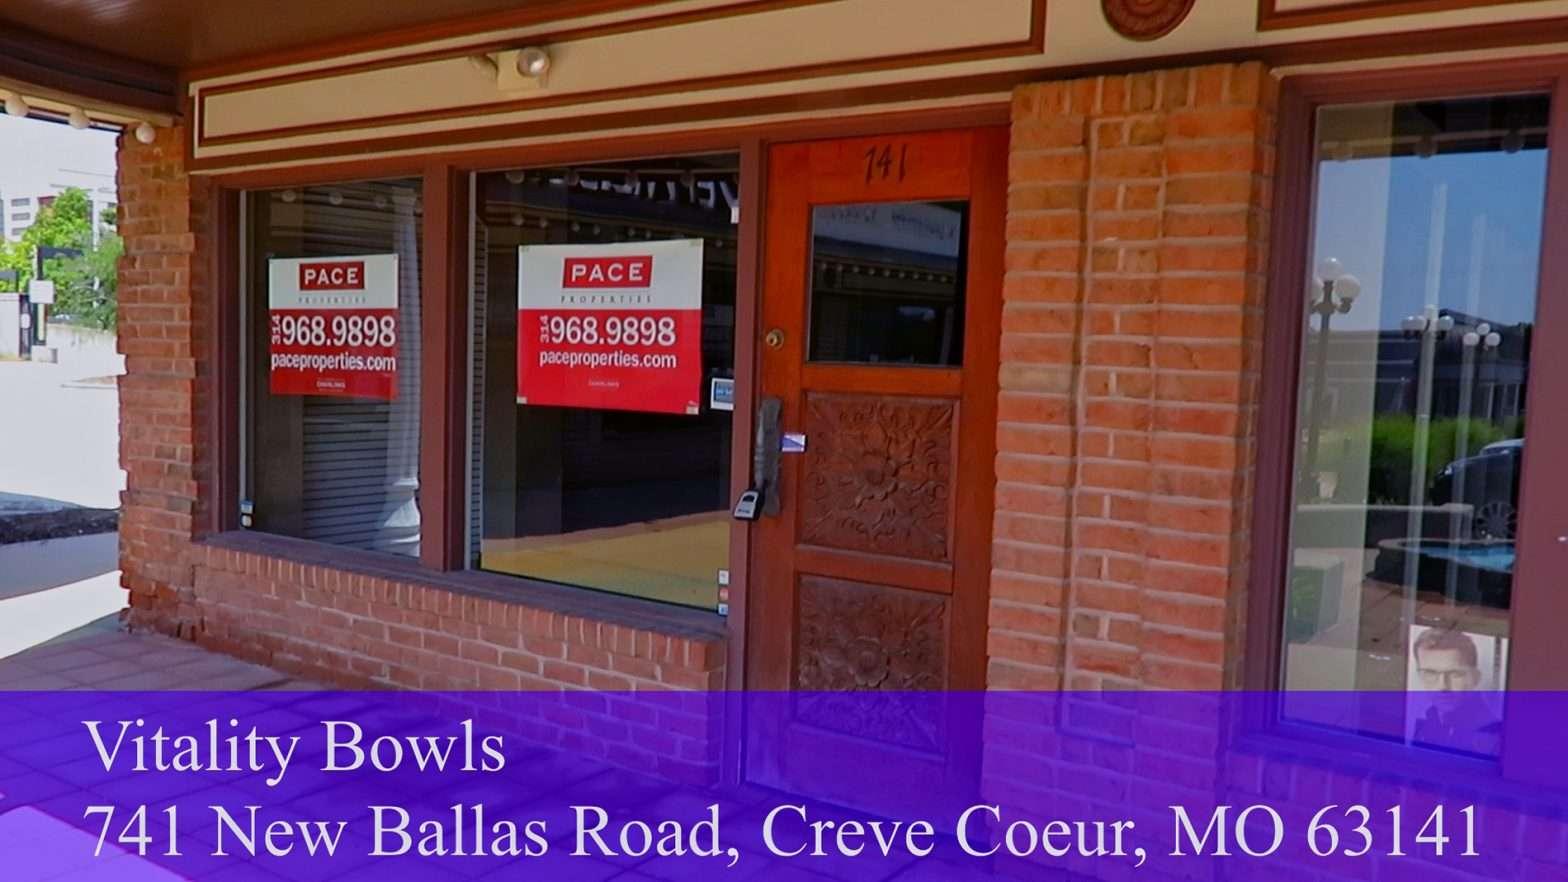 Vitality Bowls, Creve Coeur coming soon